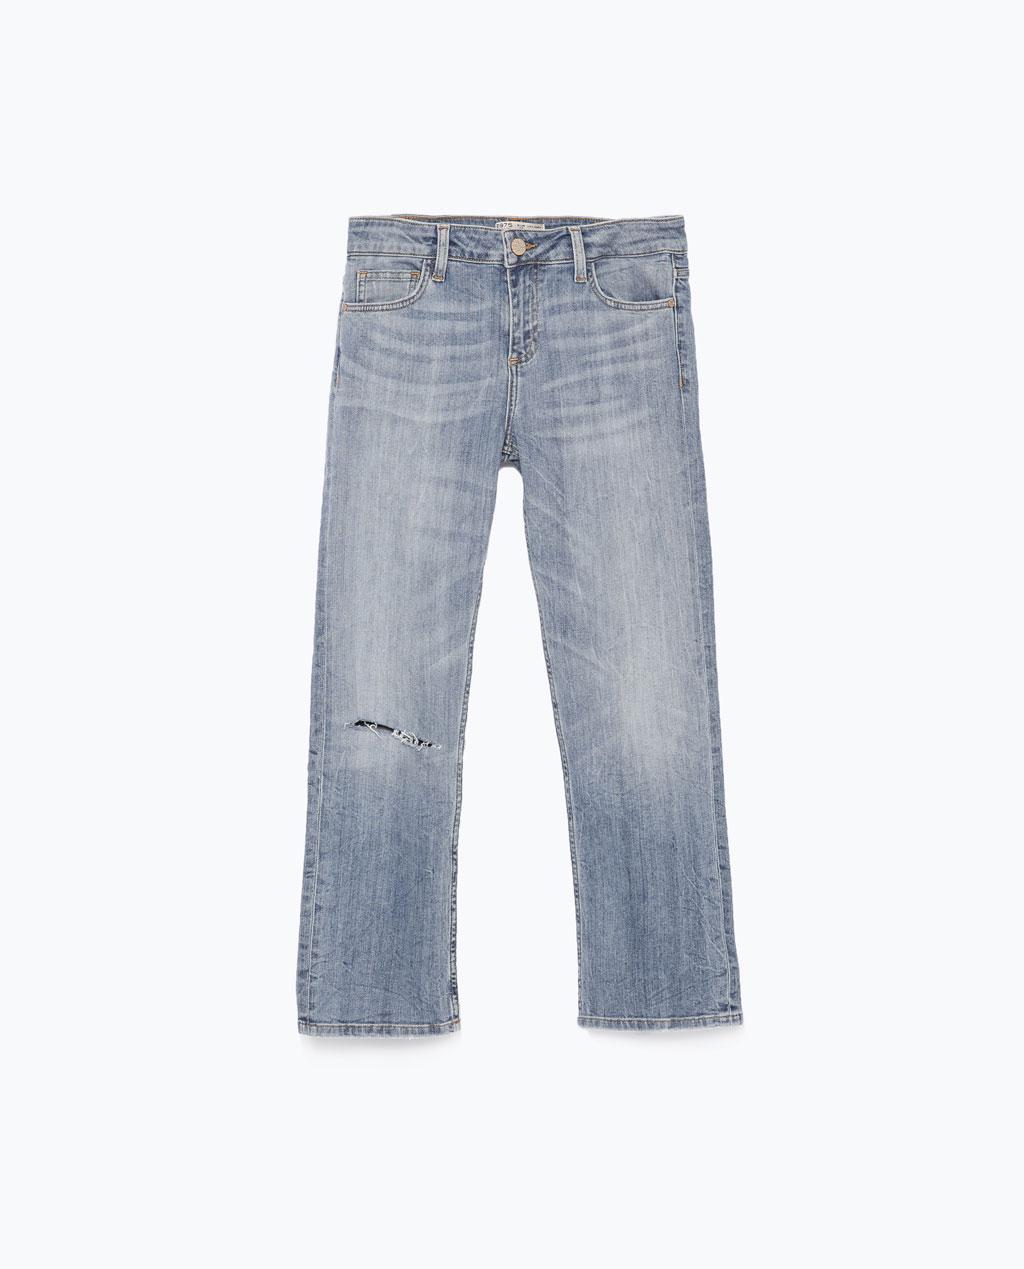 zara-lightwash-ripped-knee-cropped-jeans.jpg